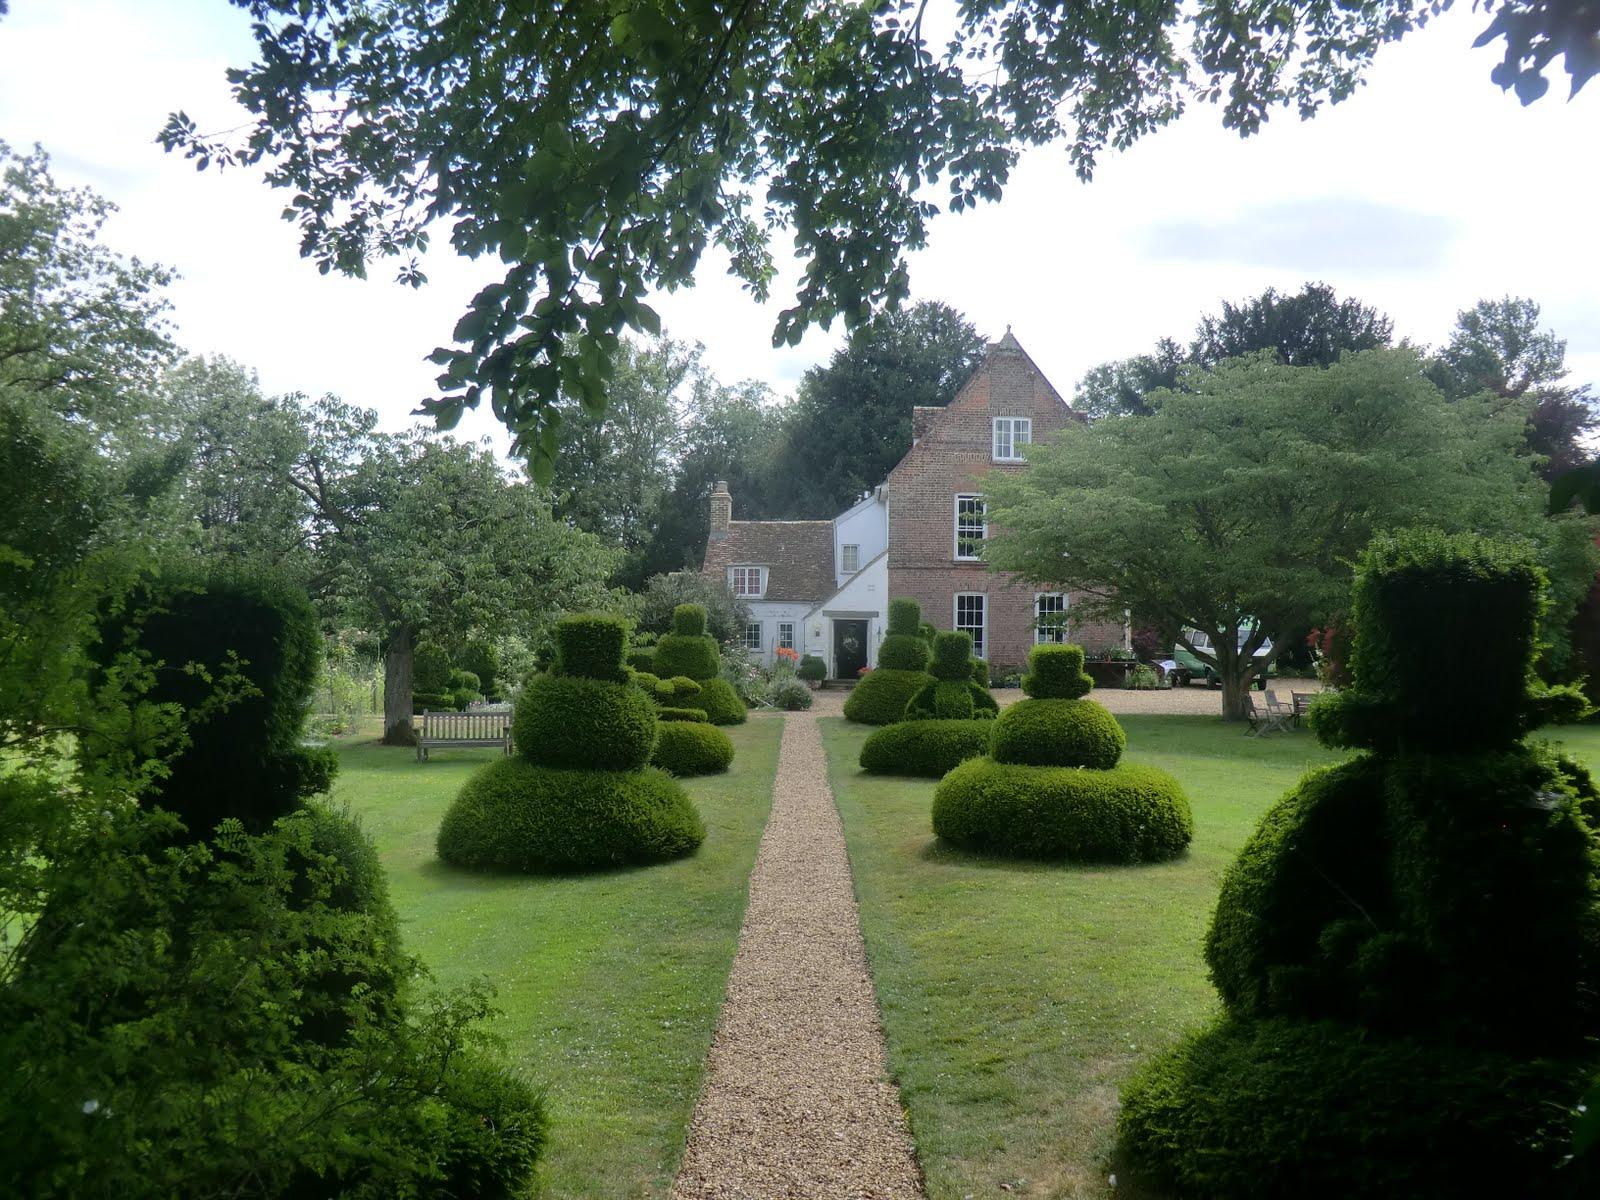 CIMG8920 The Manor Garden, Hemingford Grey